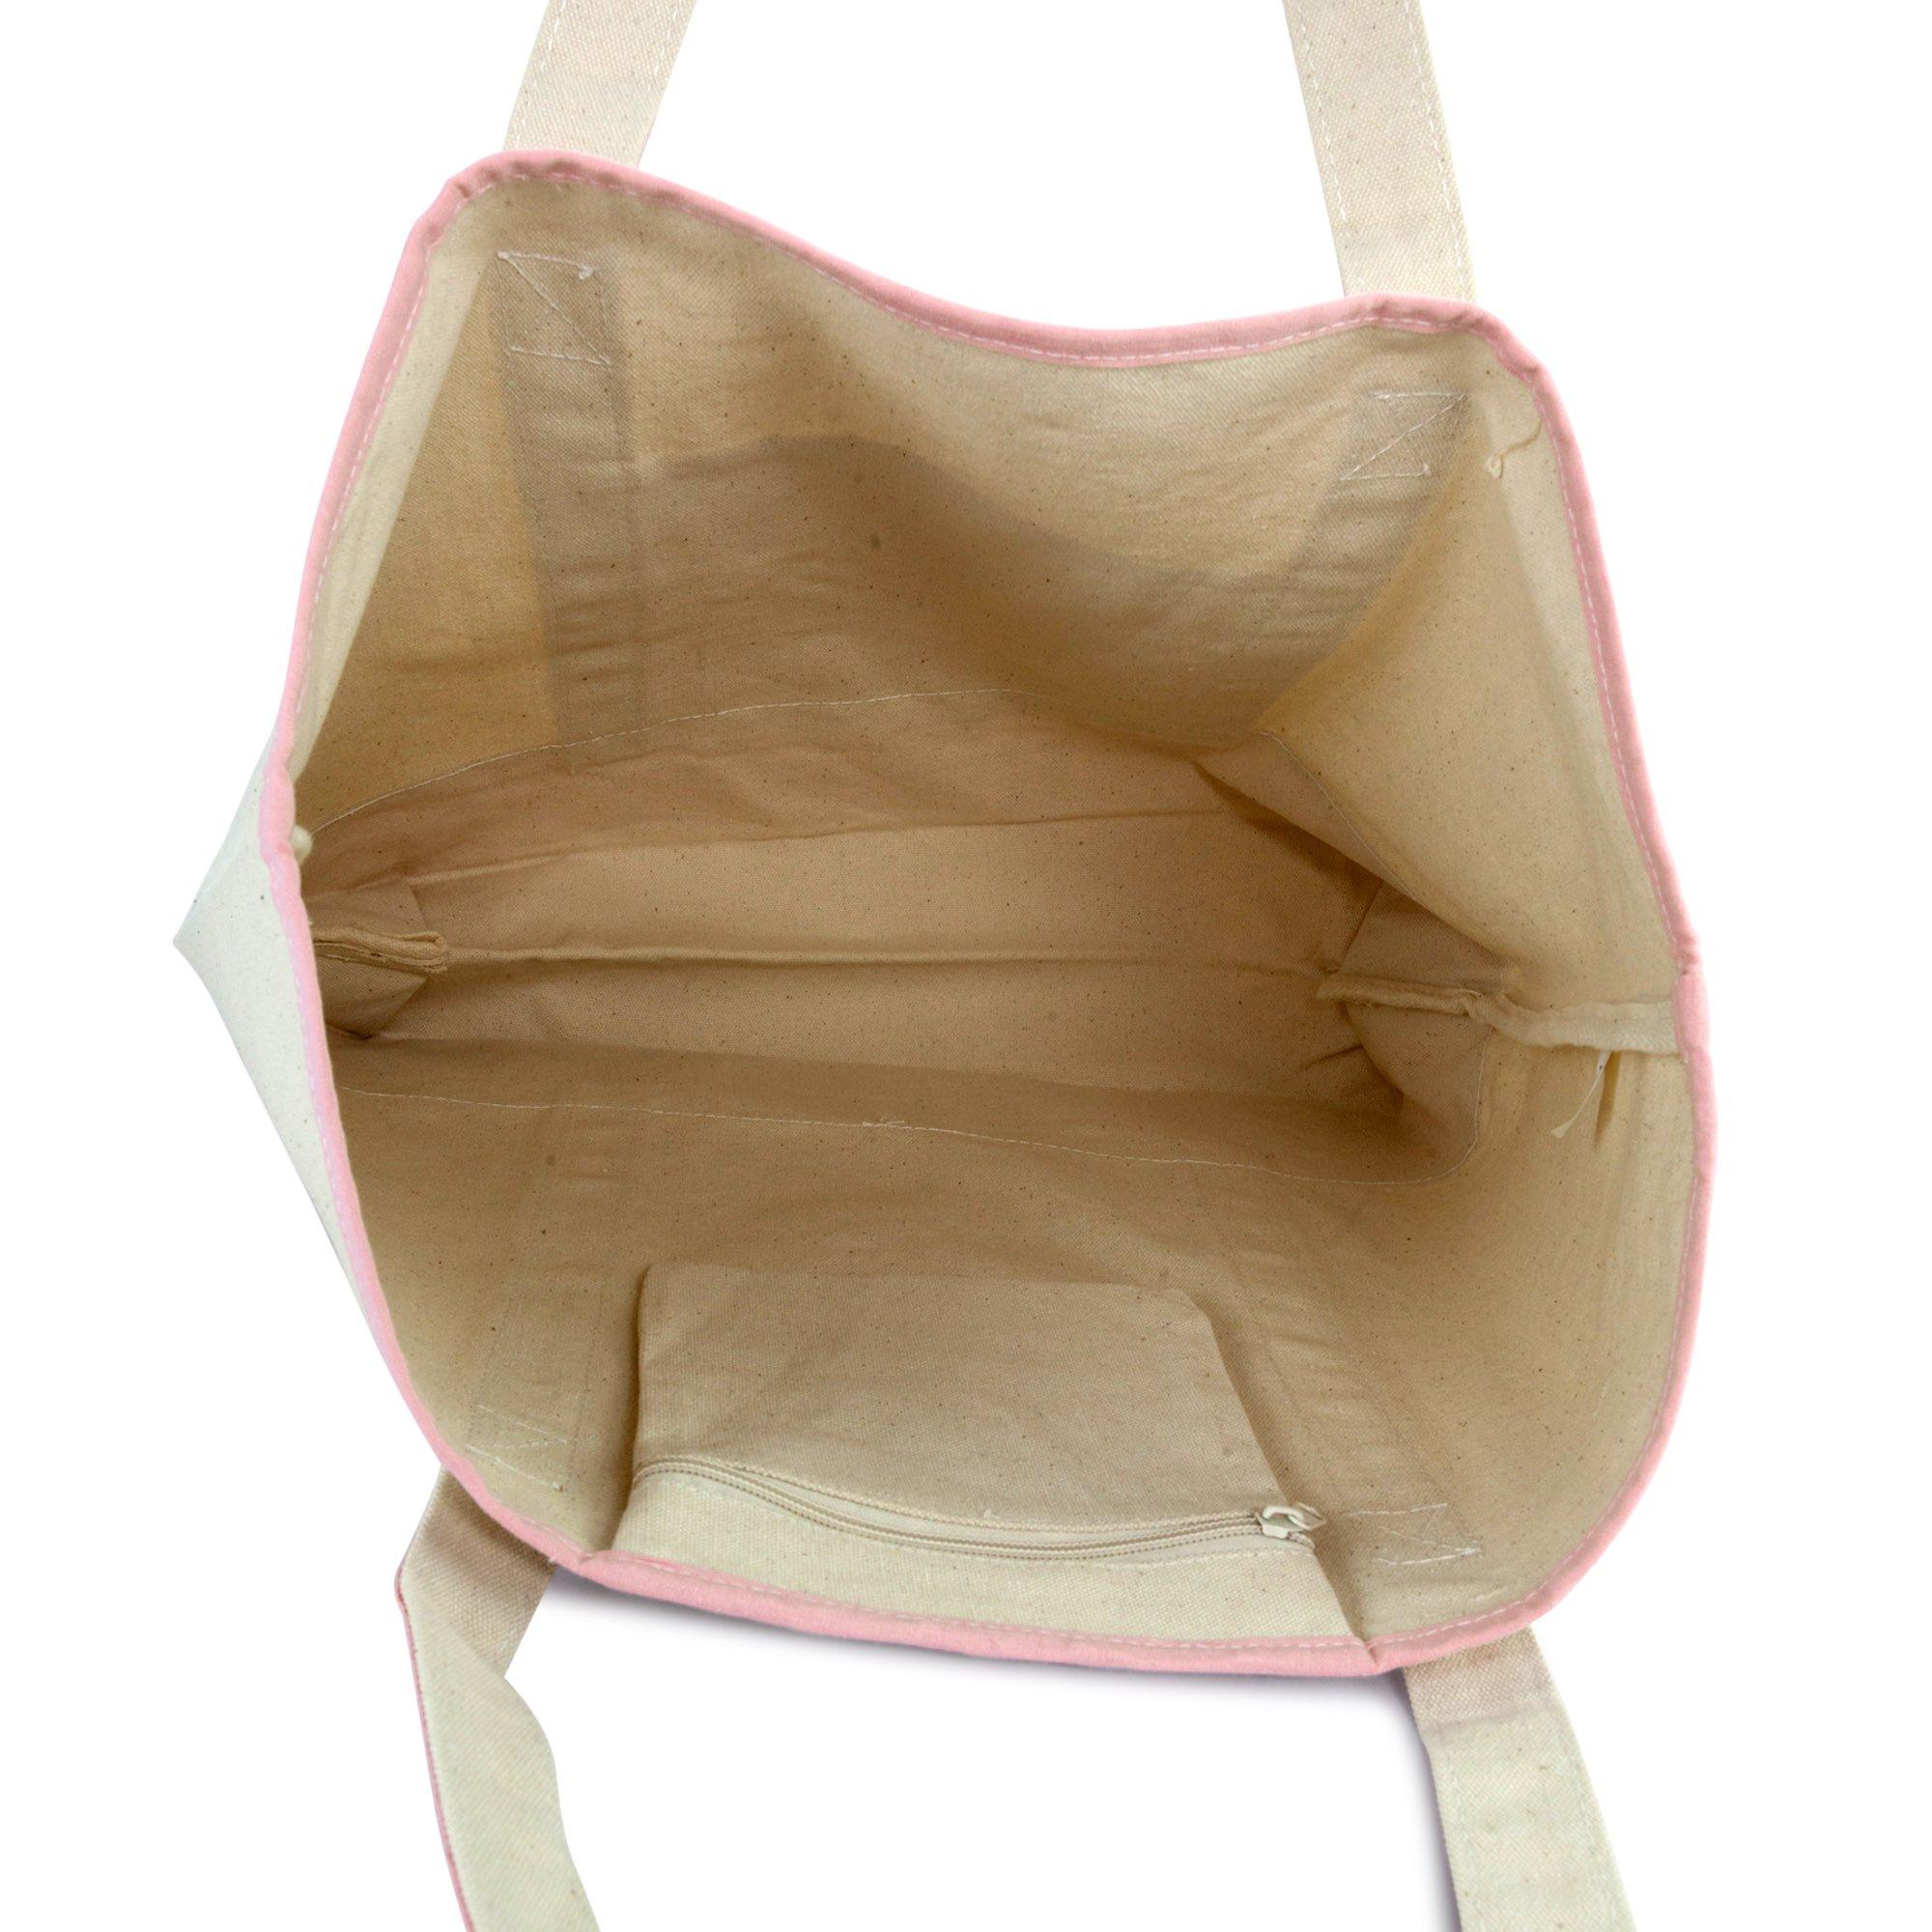 DALIX Women's Cotton Canvas Tote Bag Large Shoulder Bags Pink Monogram G by DALIX (Image #7)